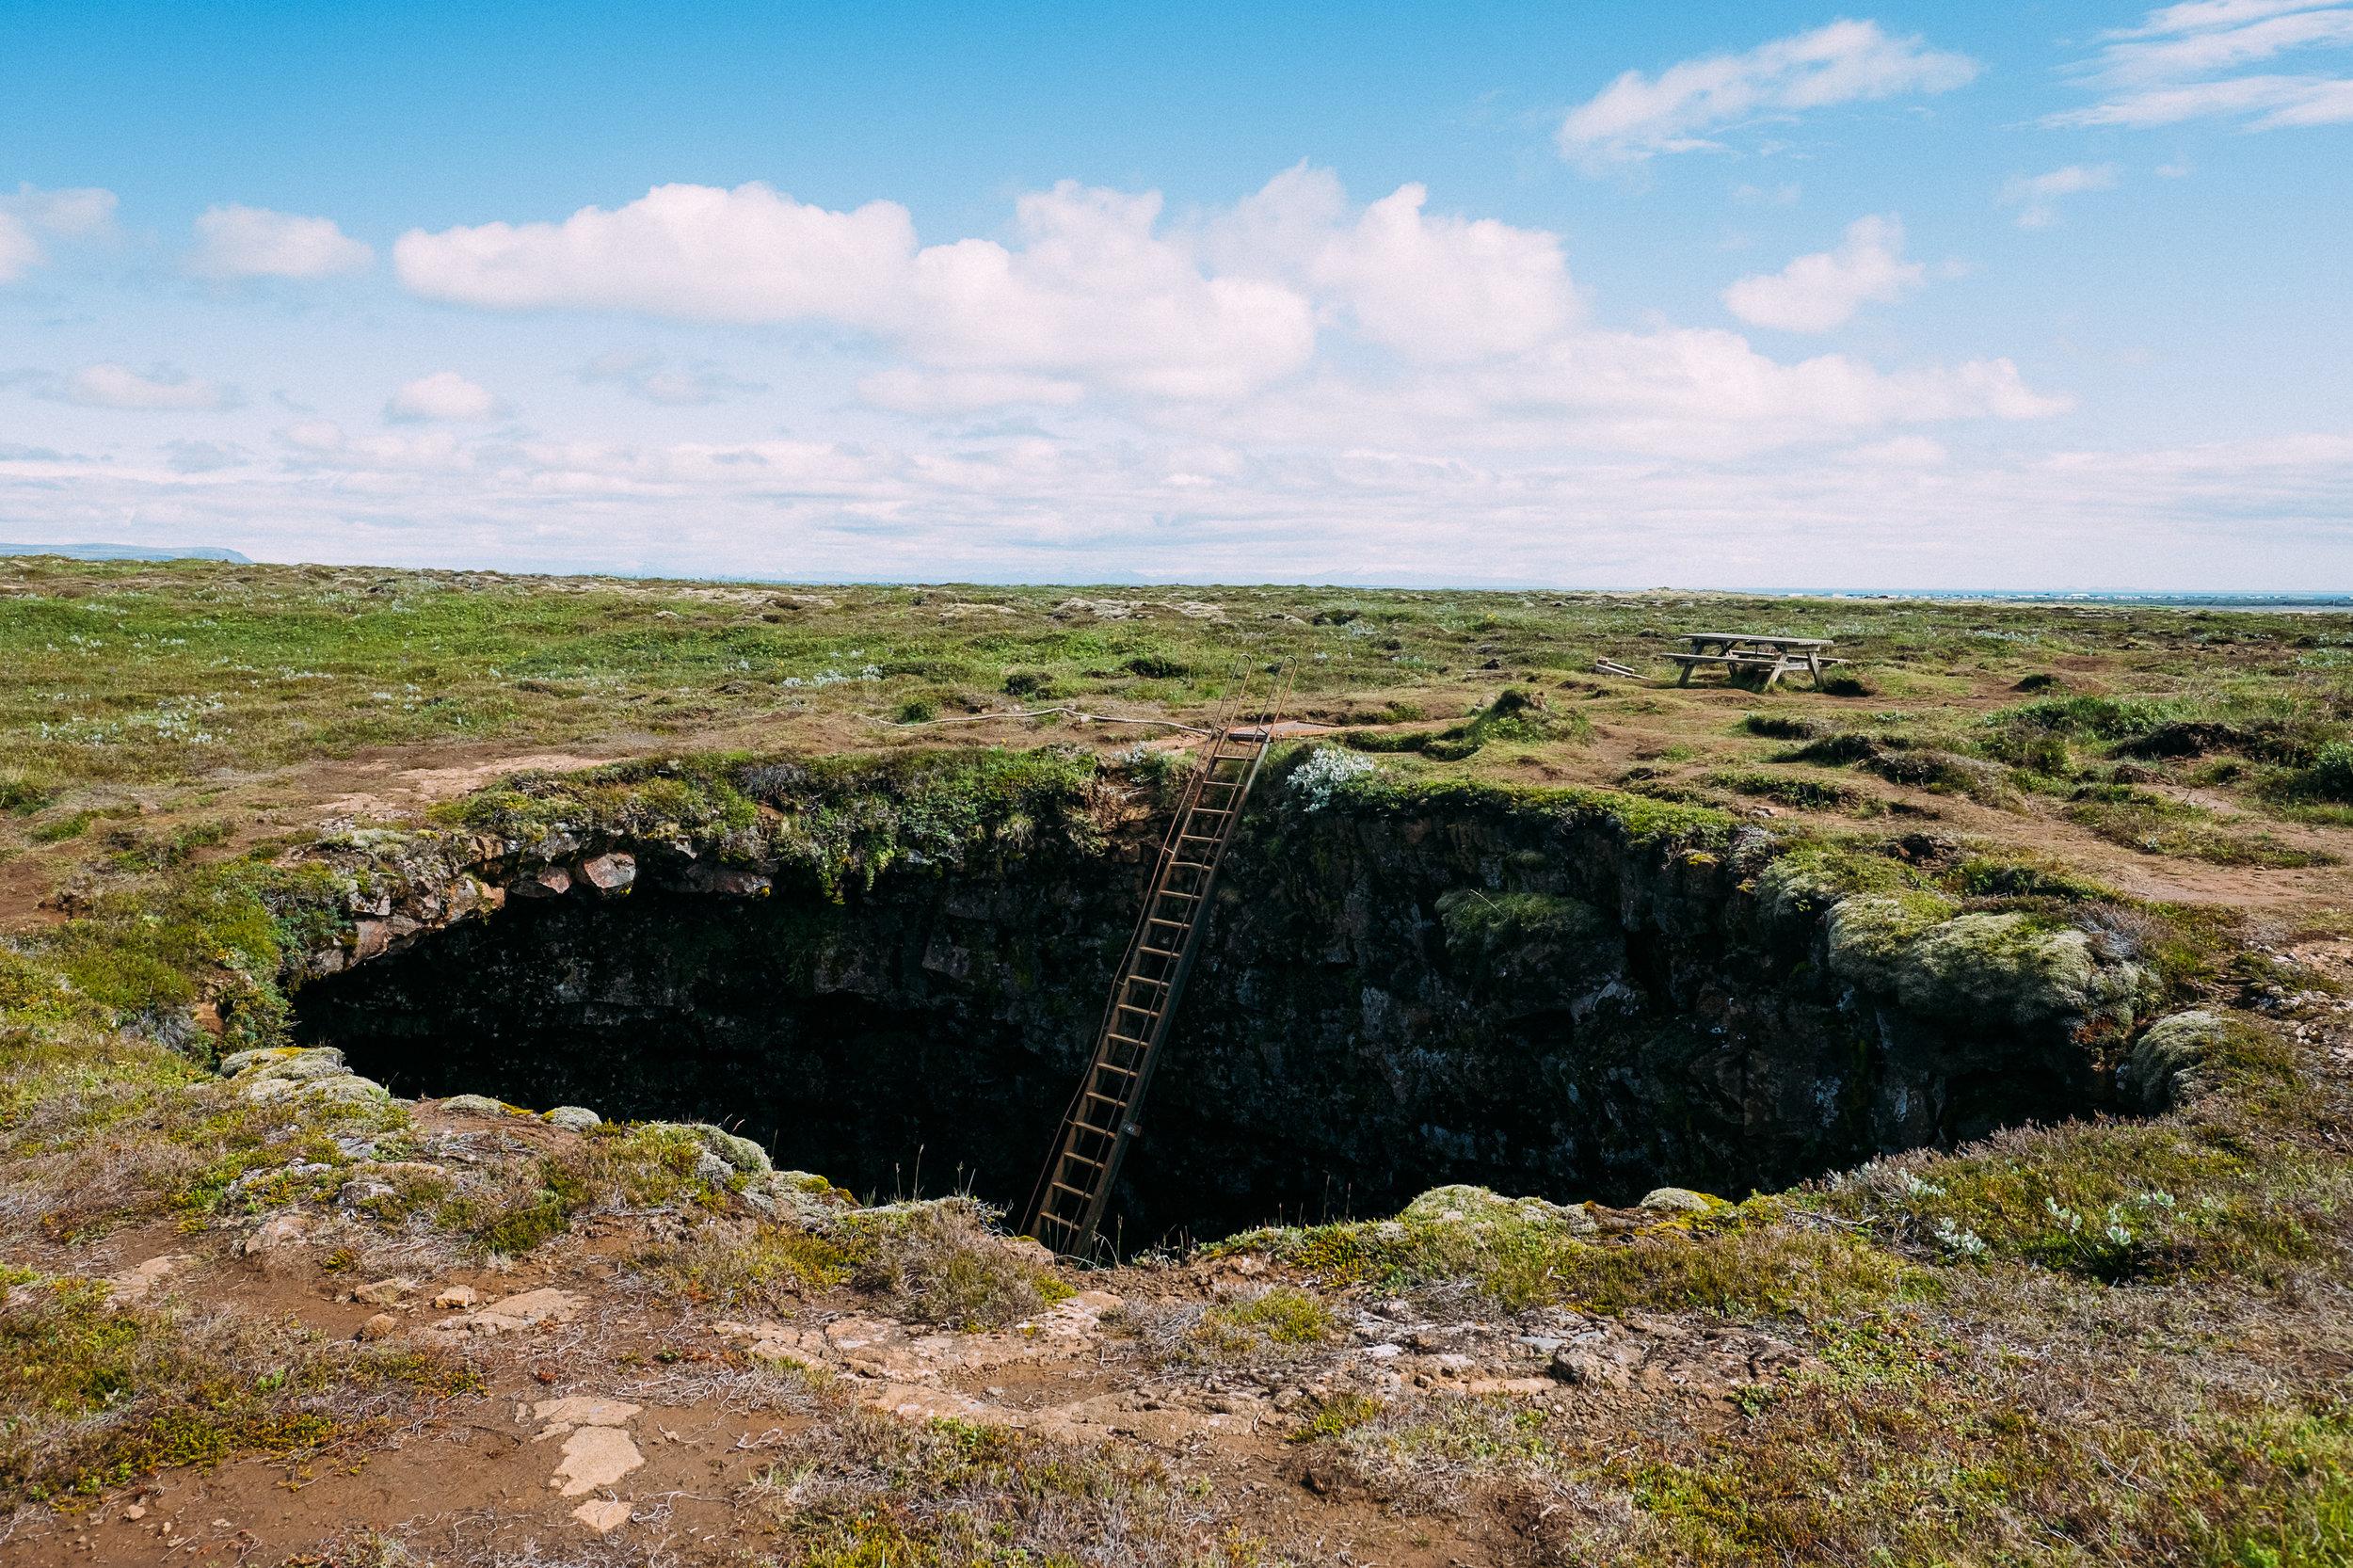 Arnarker Cave -  [63.8709682,-21.5420446]  Fuji X-H1 + 16mm 1.4 lens